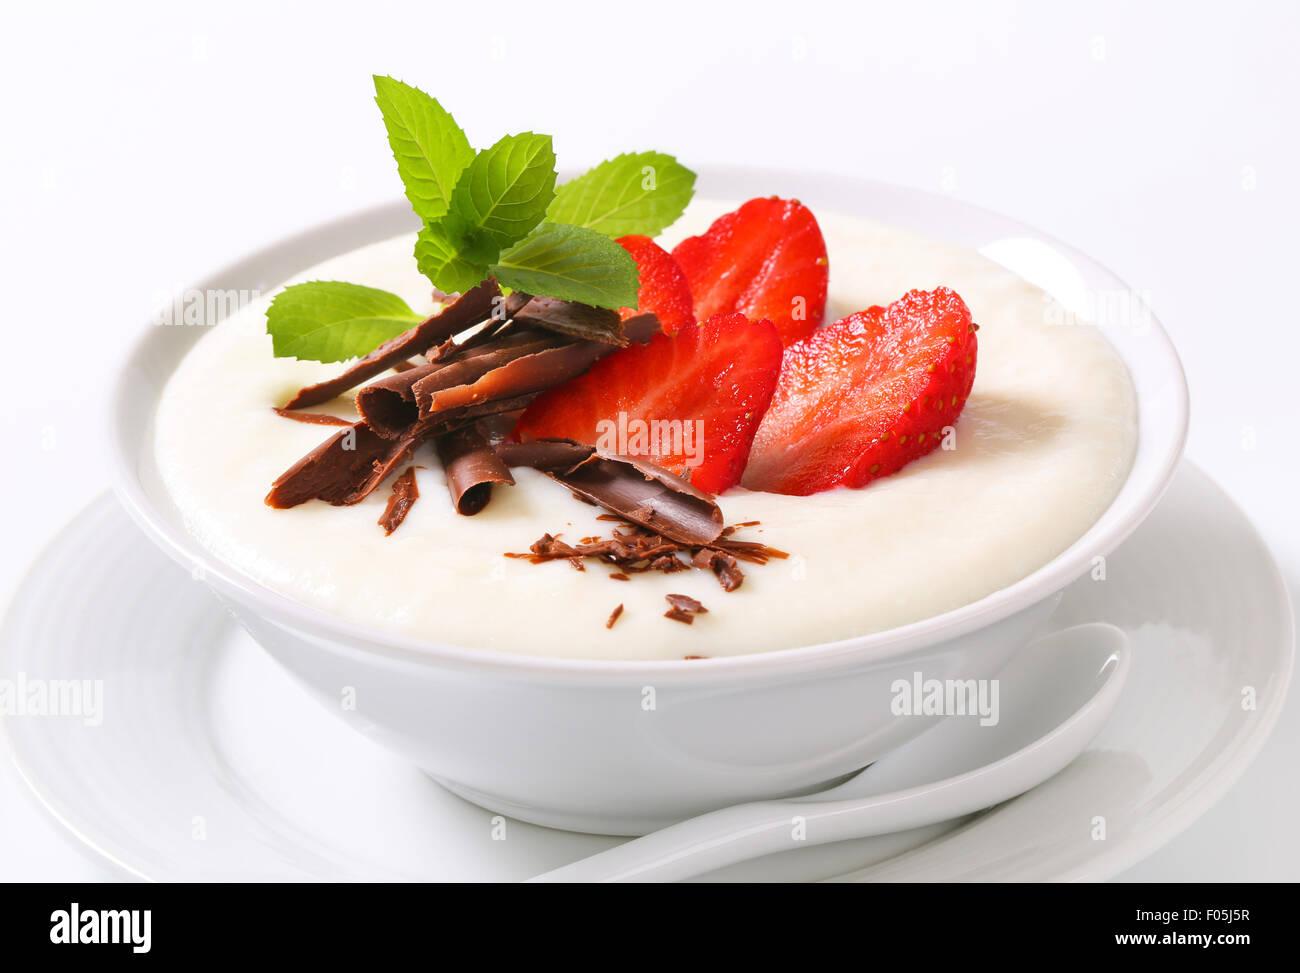 Bowl of semolina pudding with fresh strawberries - Stock Image